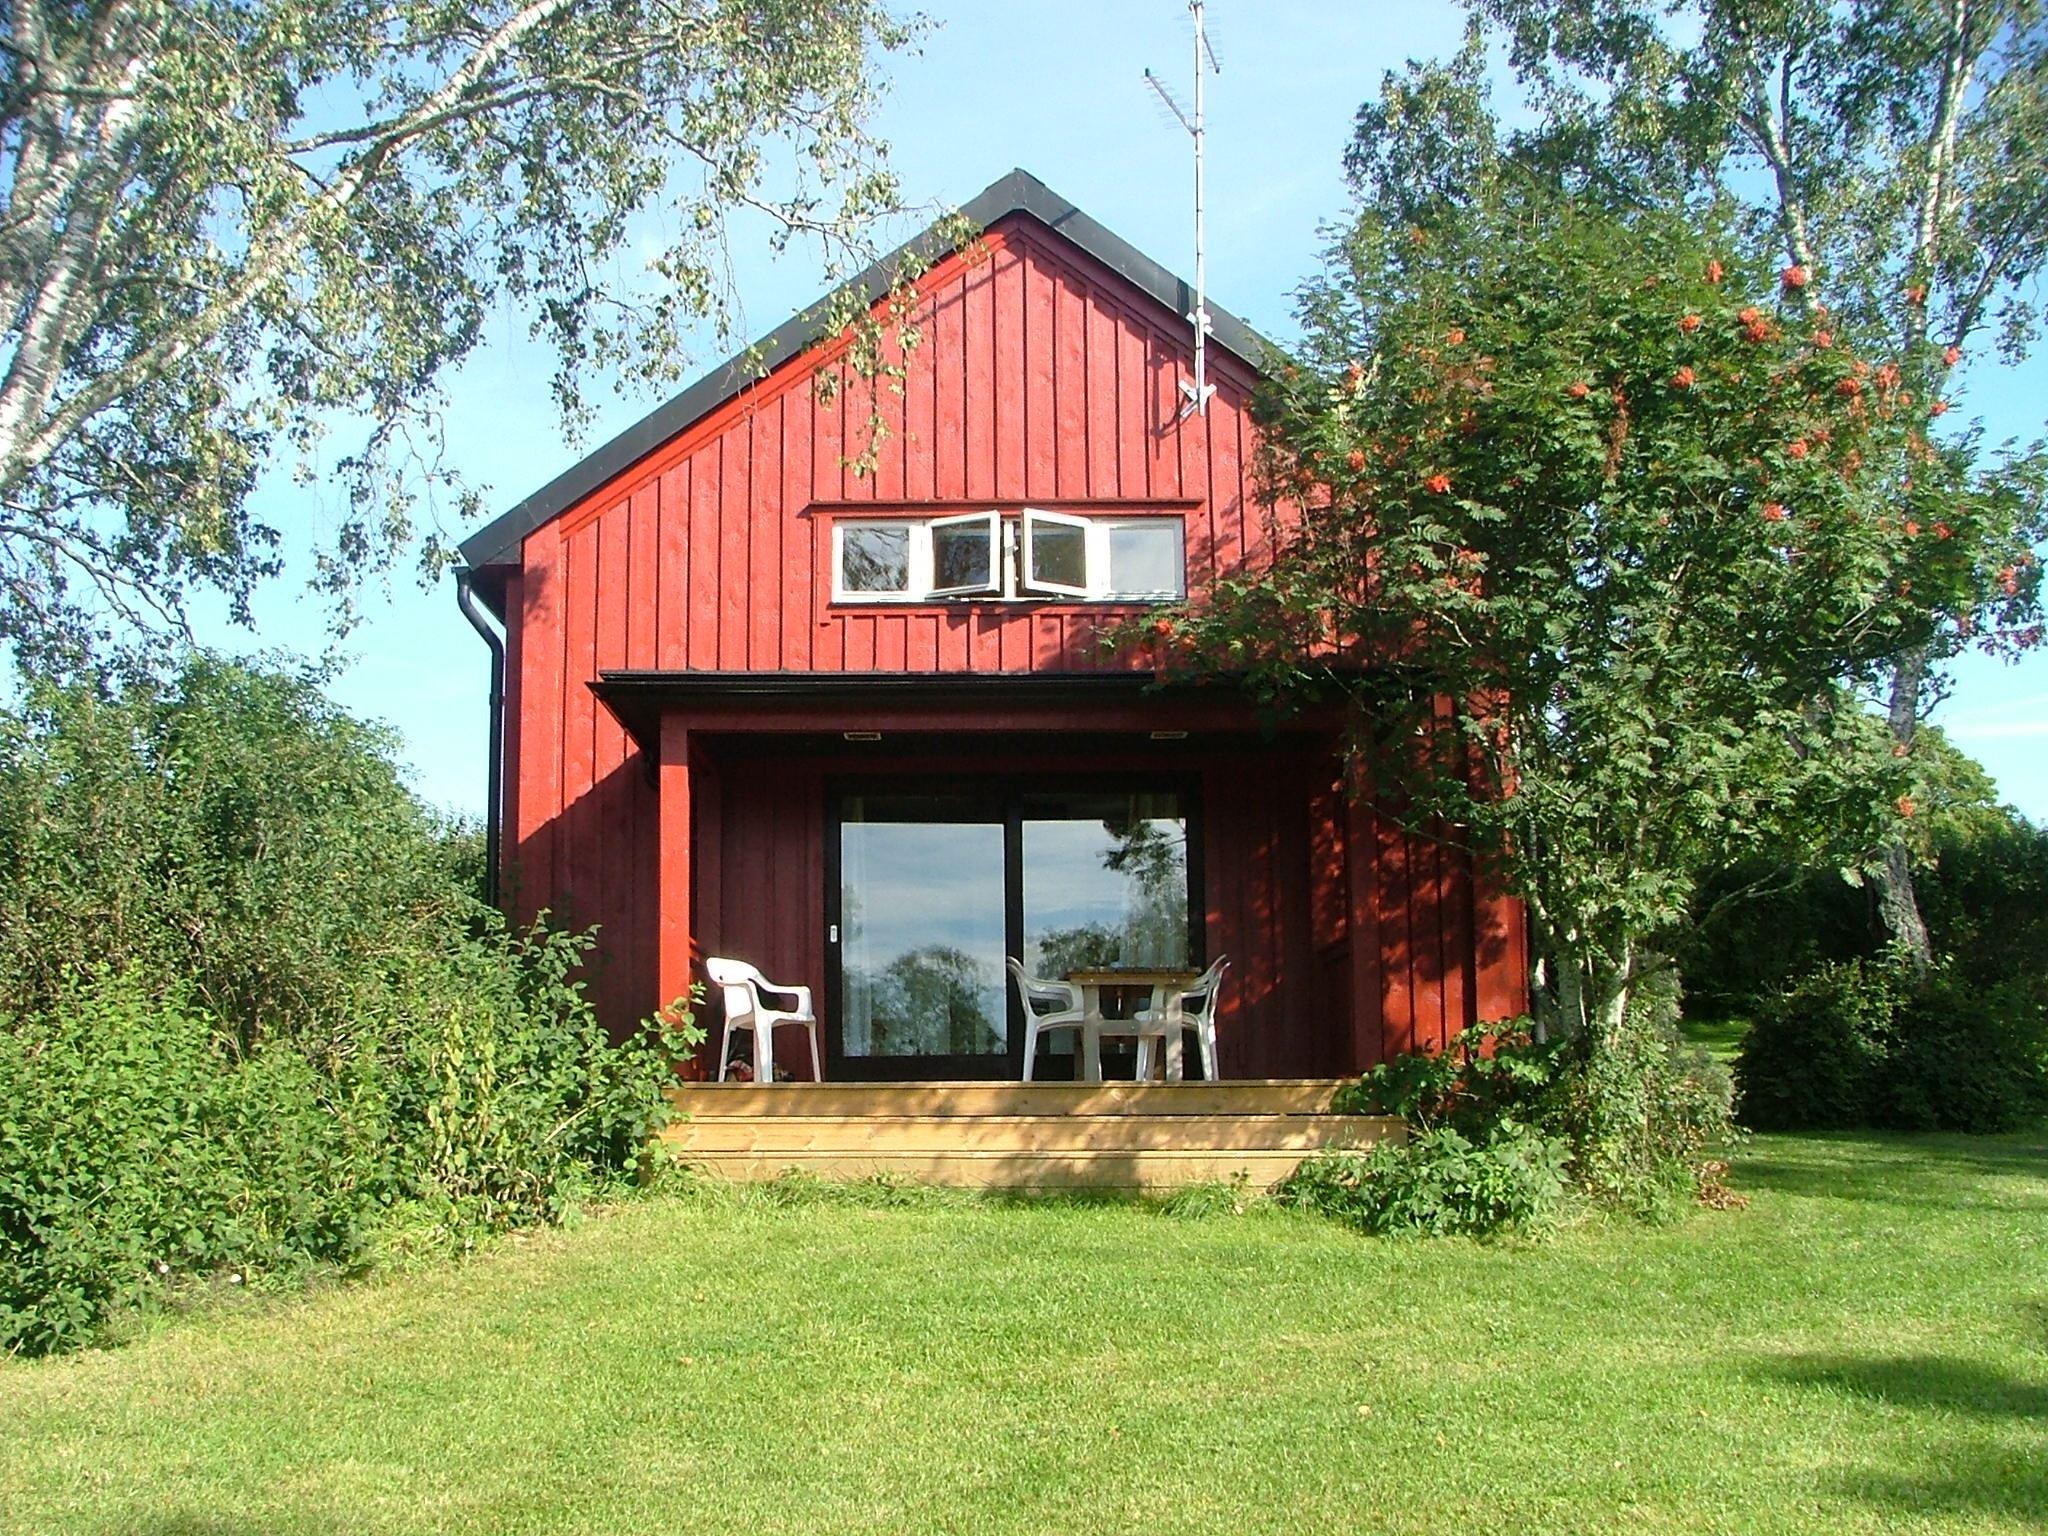 Granbergs Gästhus